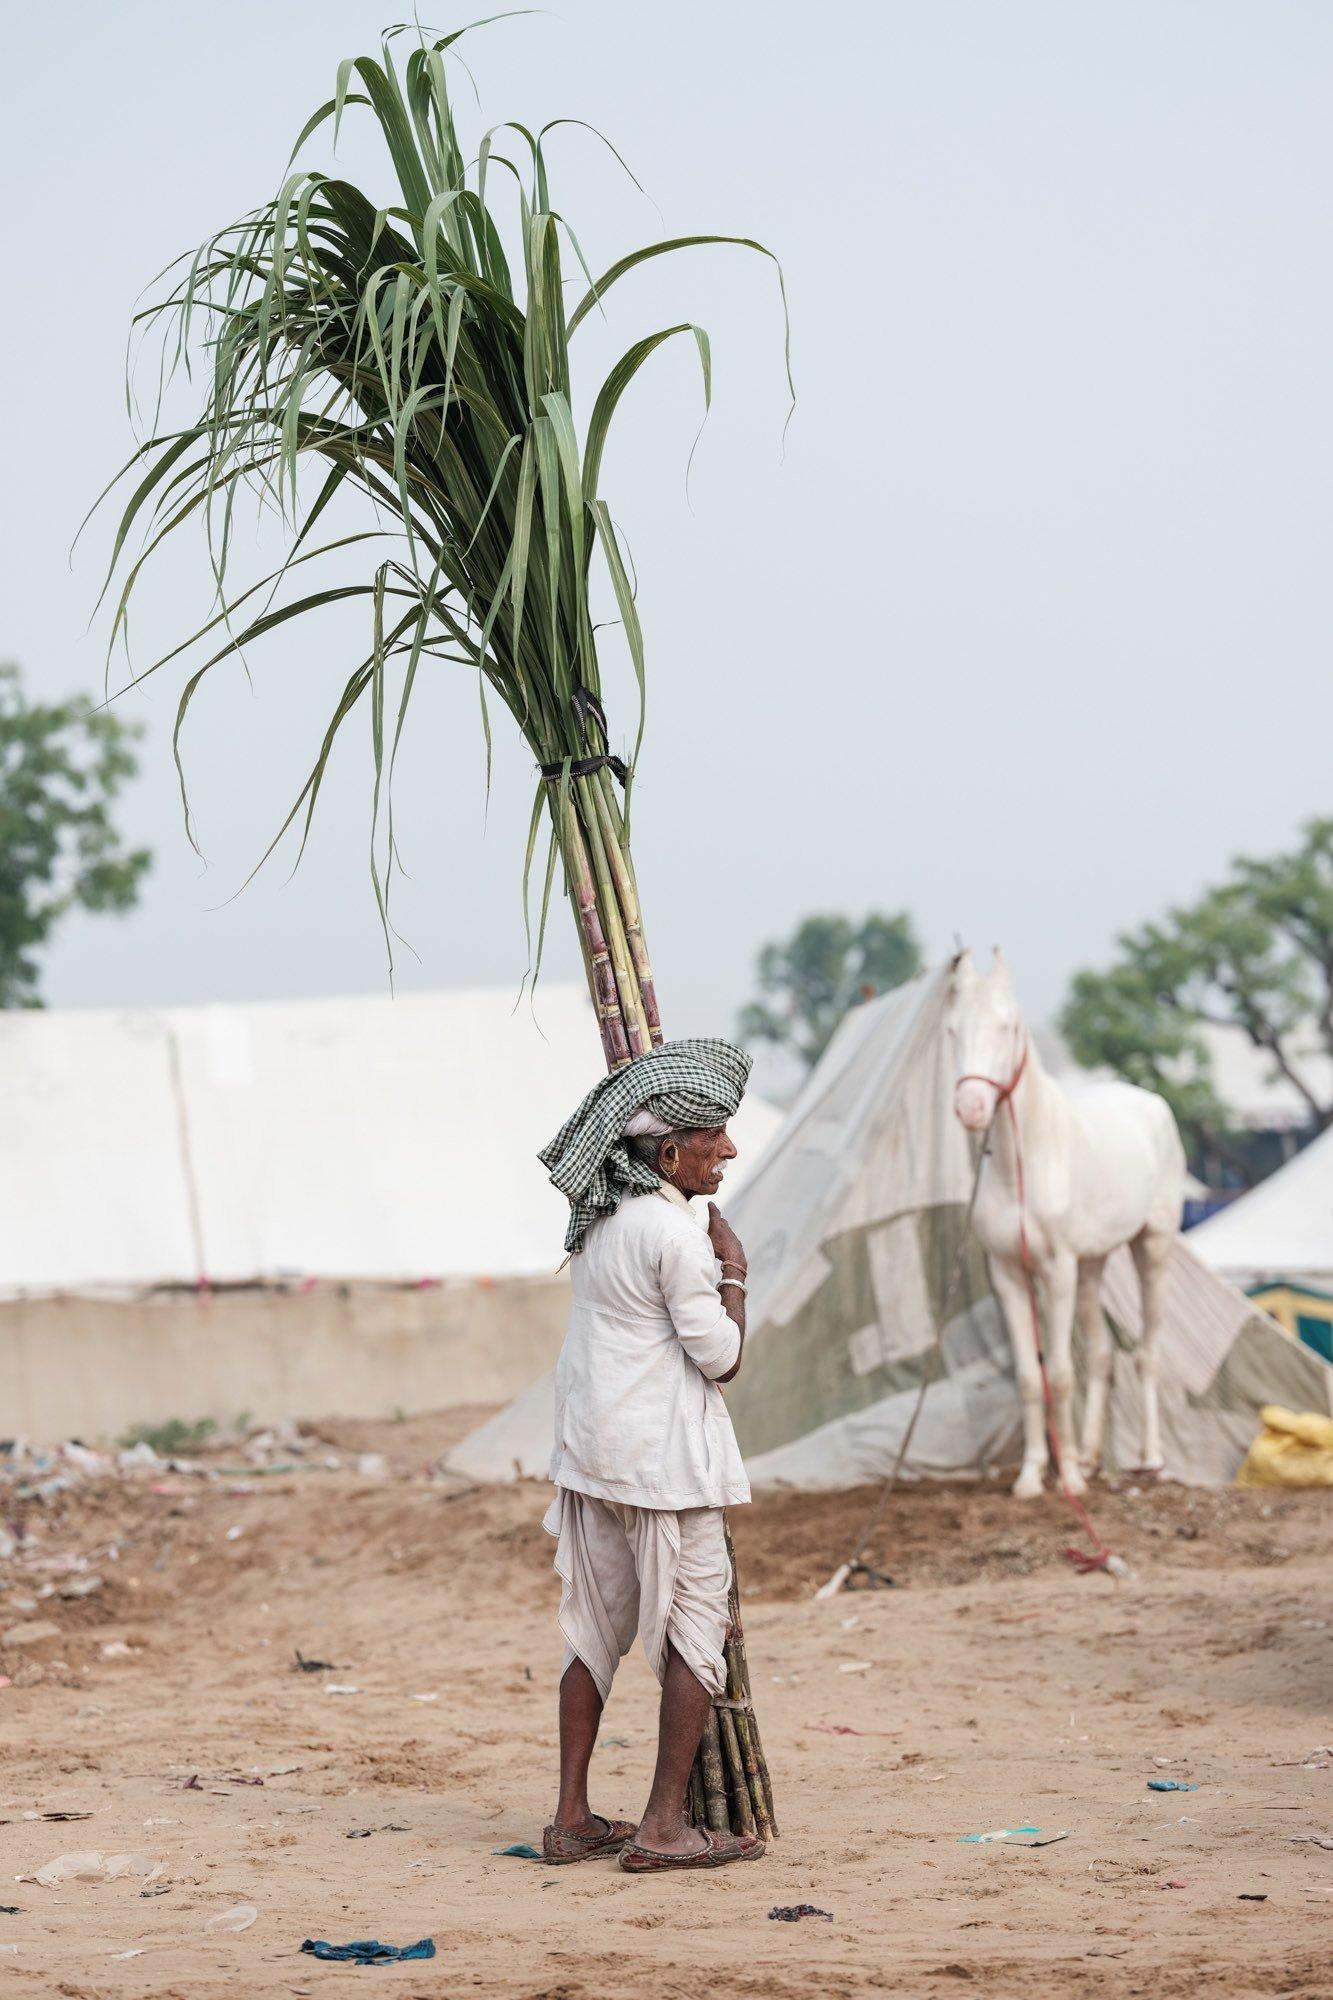 Pushkar Camel Fair Travel Documentary Photography India Jose Jeuland-7-4